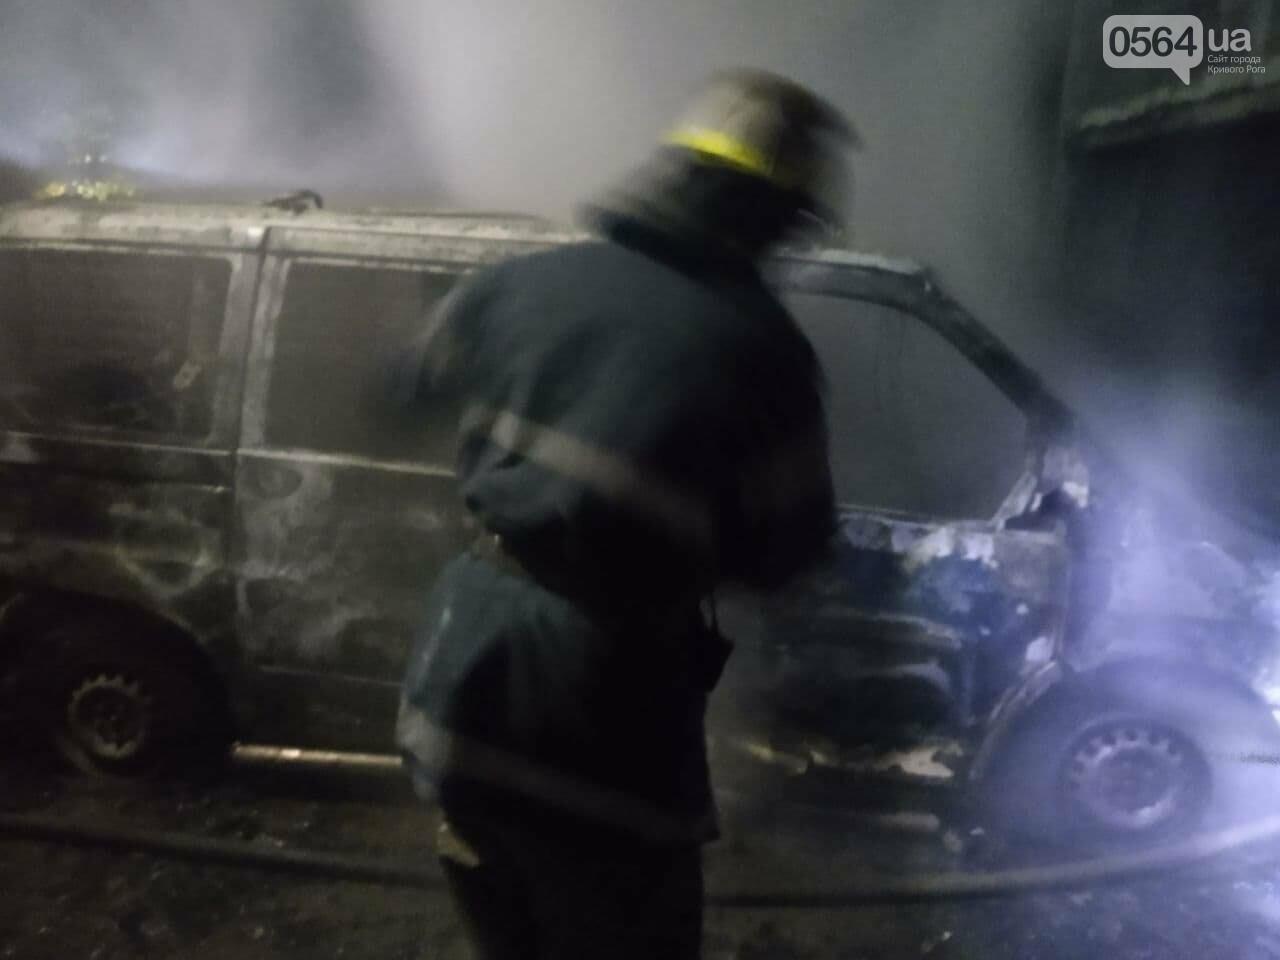 Один - на ходу, второй - на стоянке, - в Кривом Роге загорелись 2 автомобиля, - ФОТО, ВИДЕО, фото-1